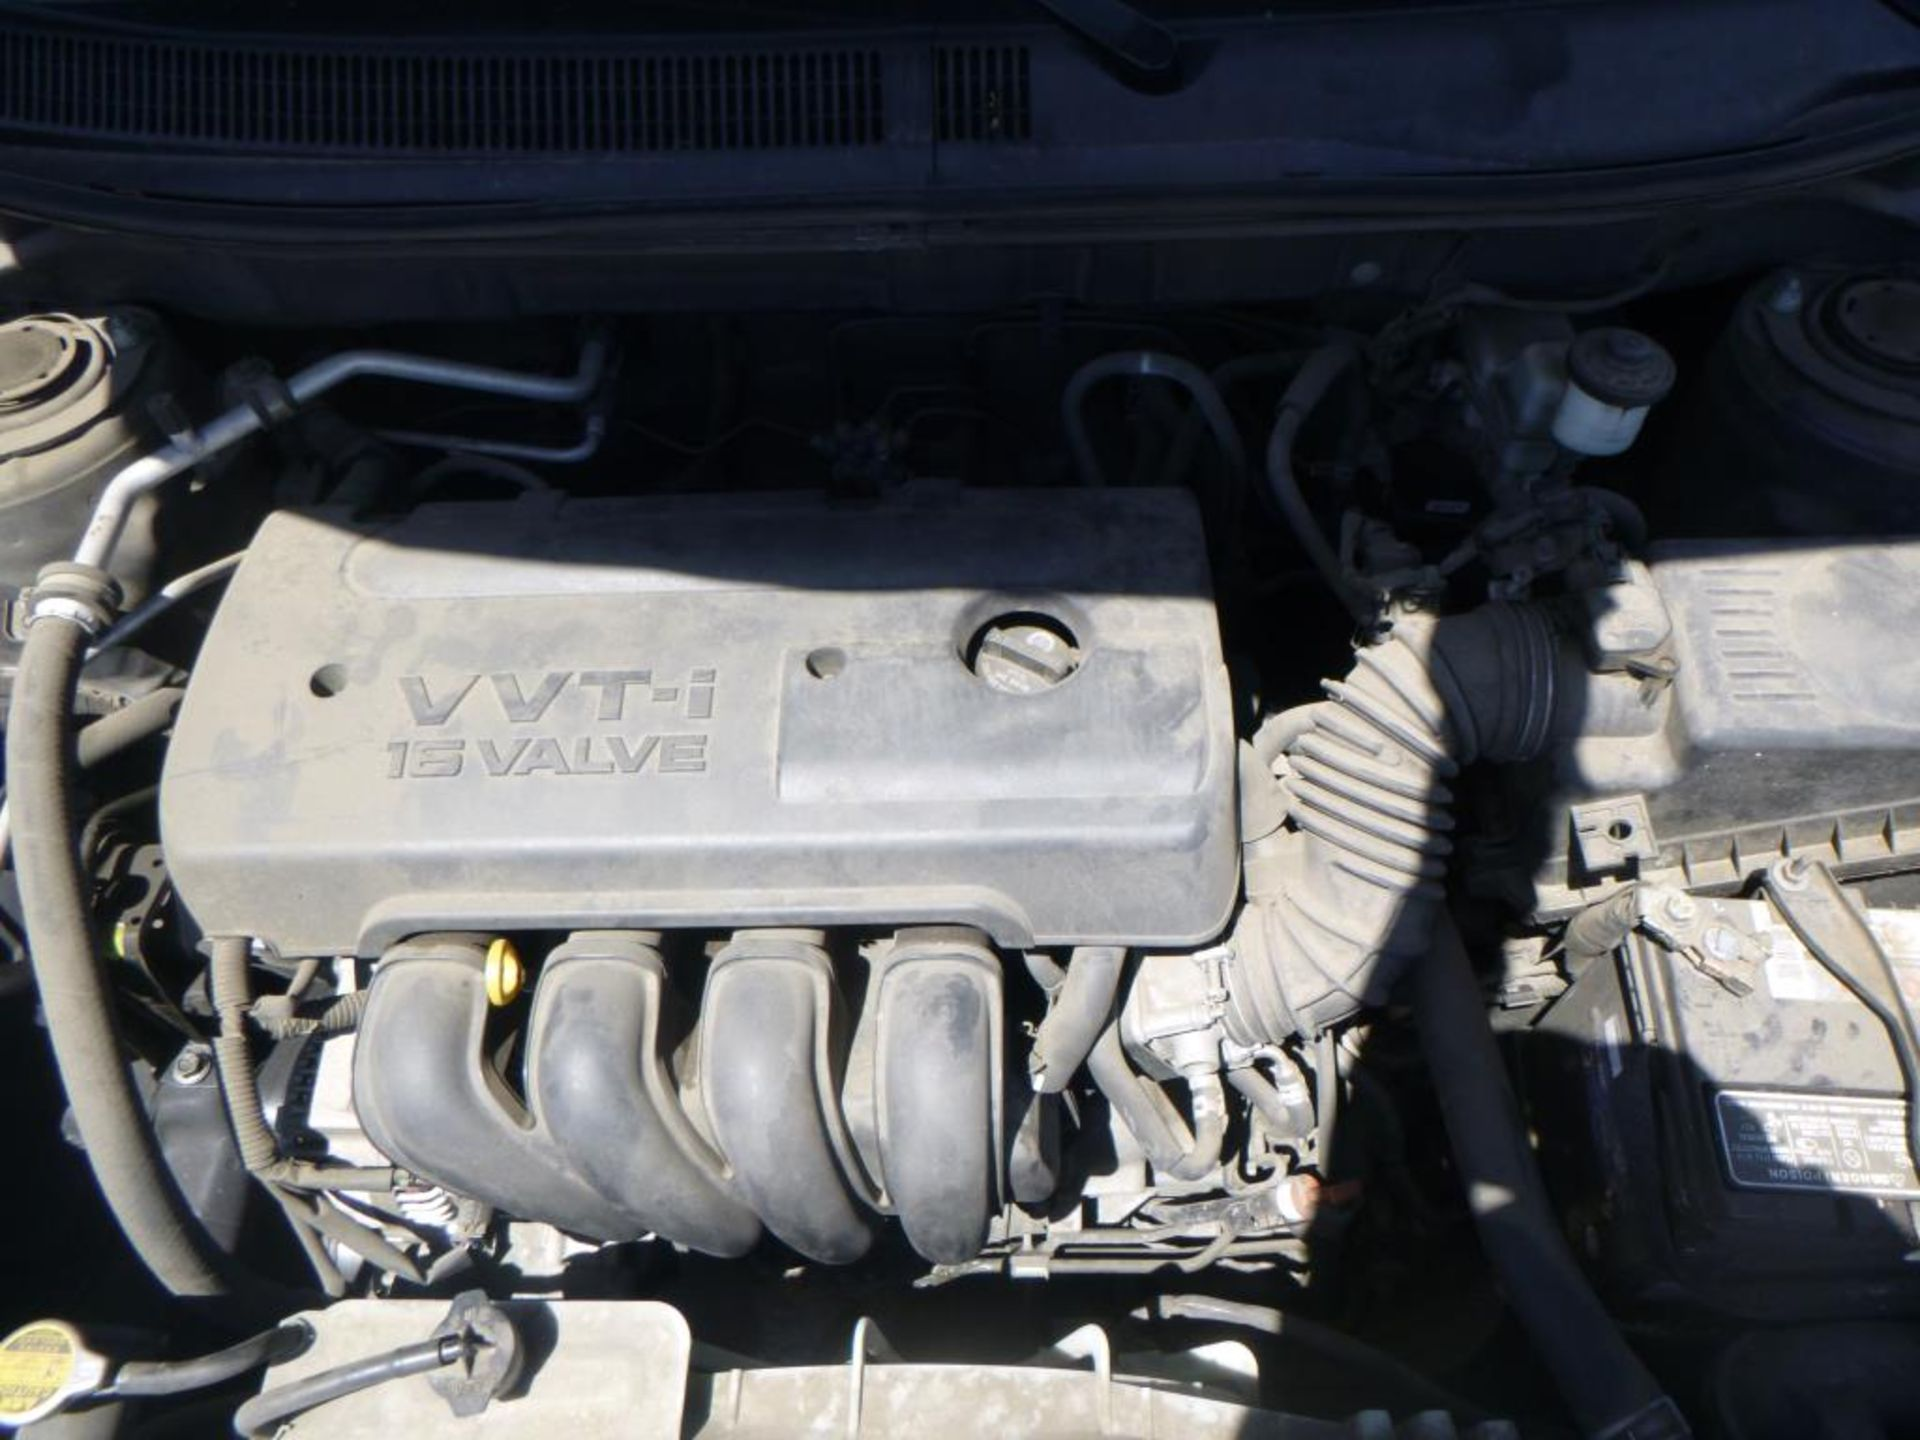 2006 Pontiac Vibe - Image 5 of 14